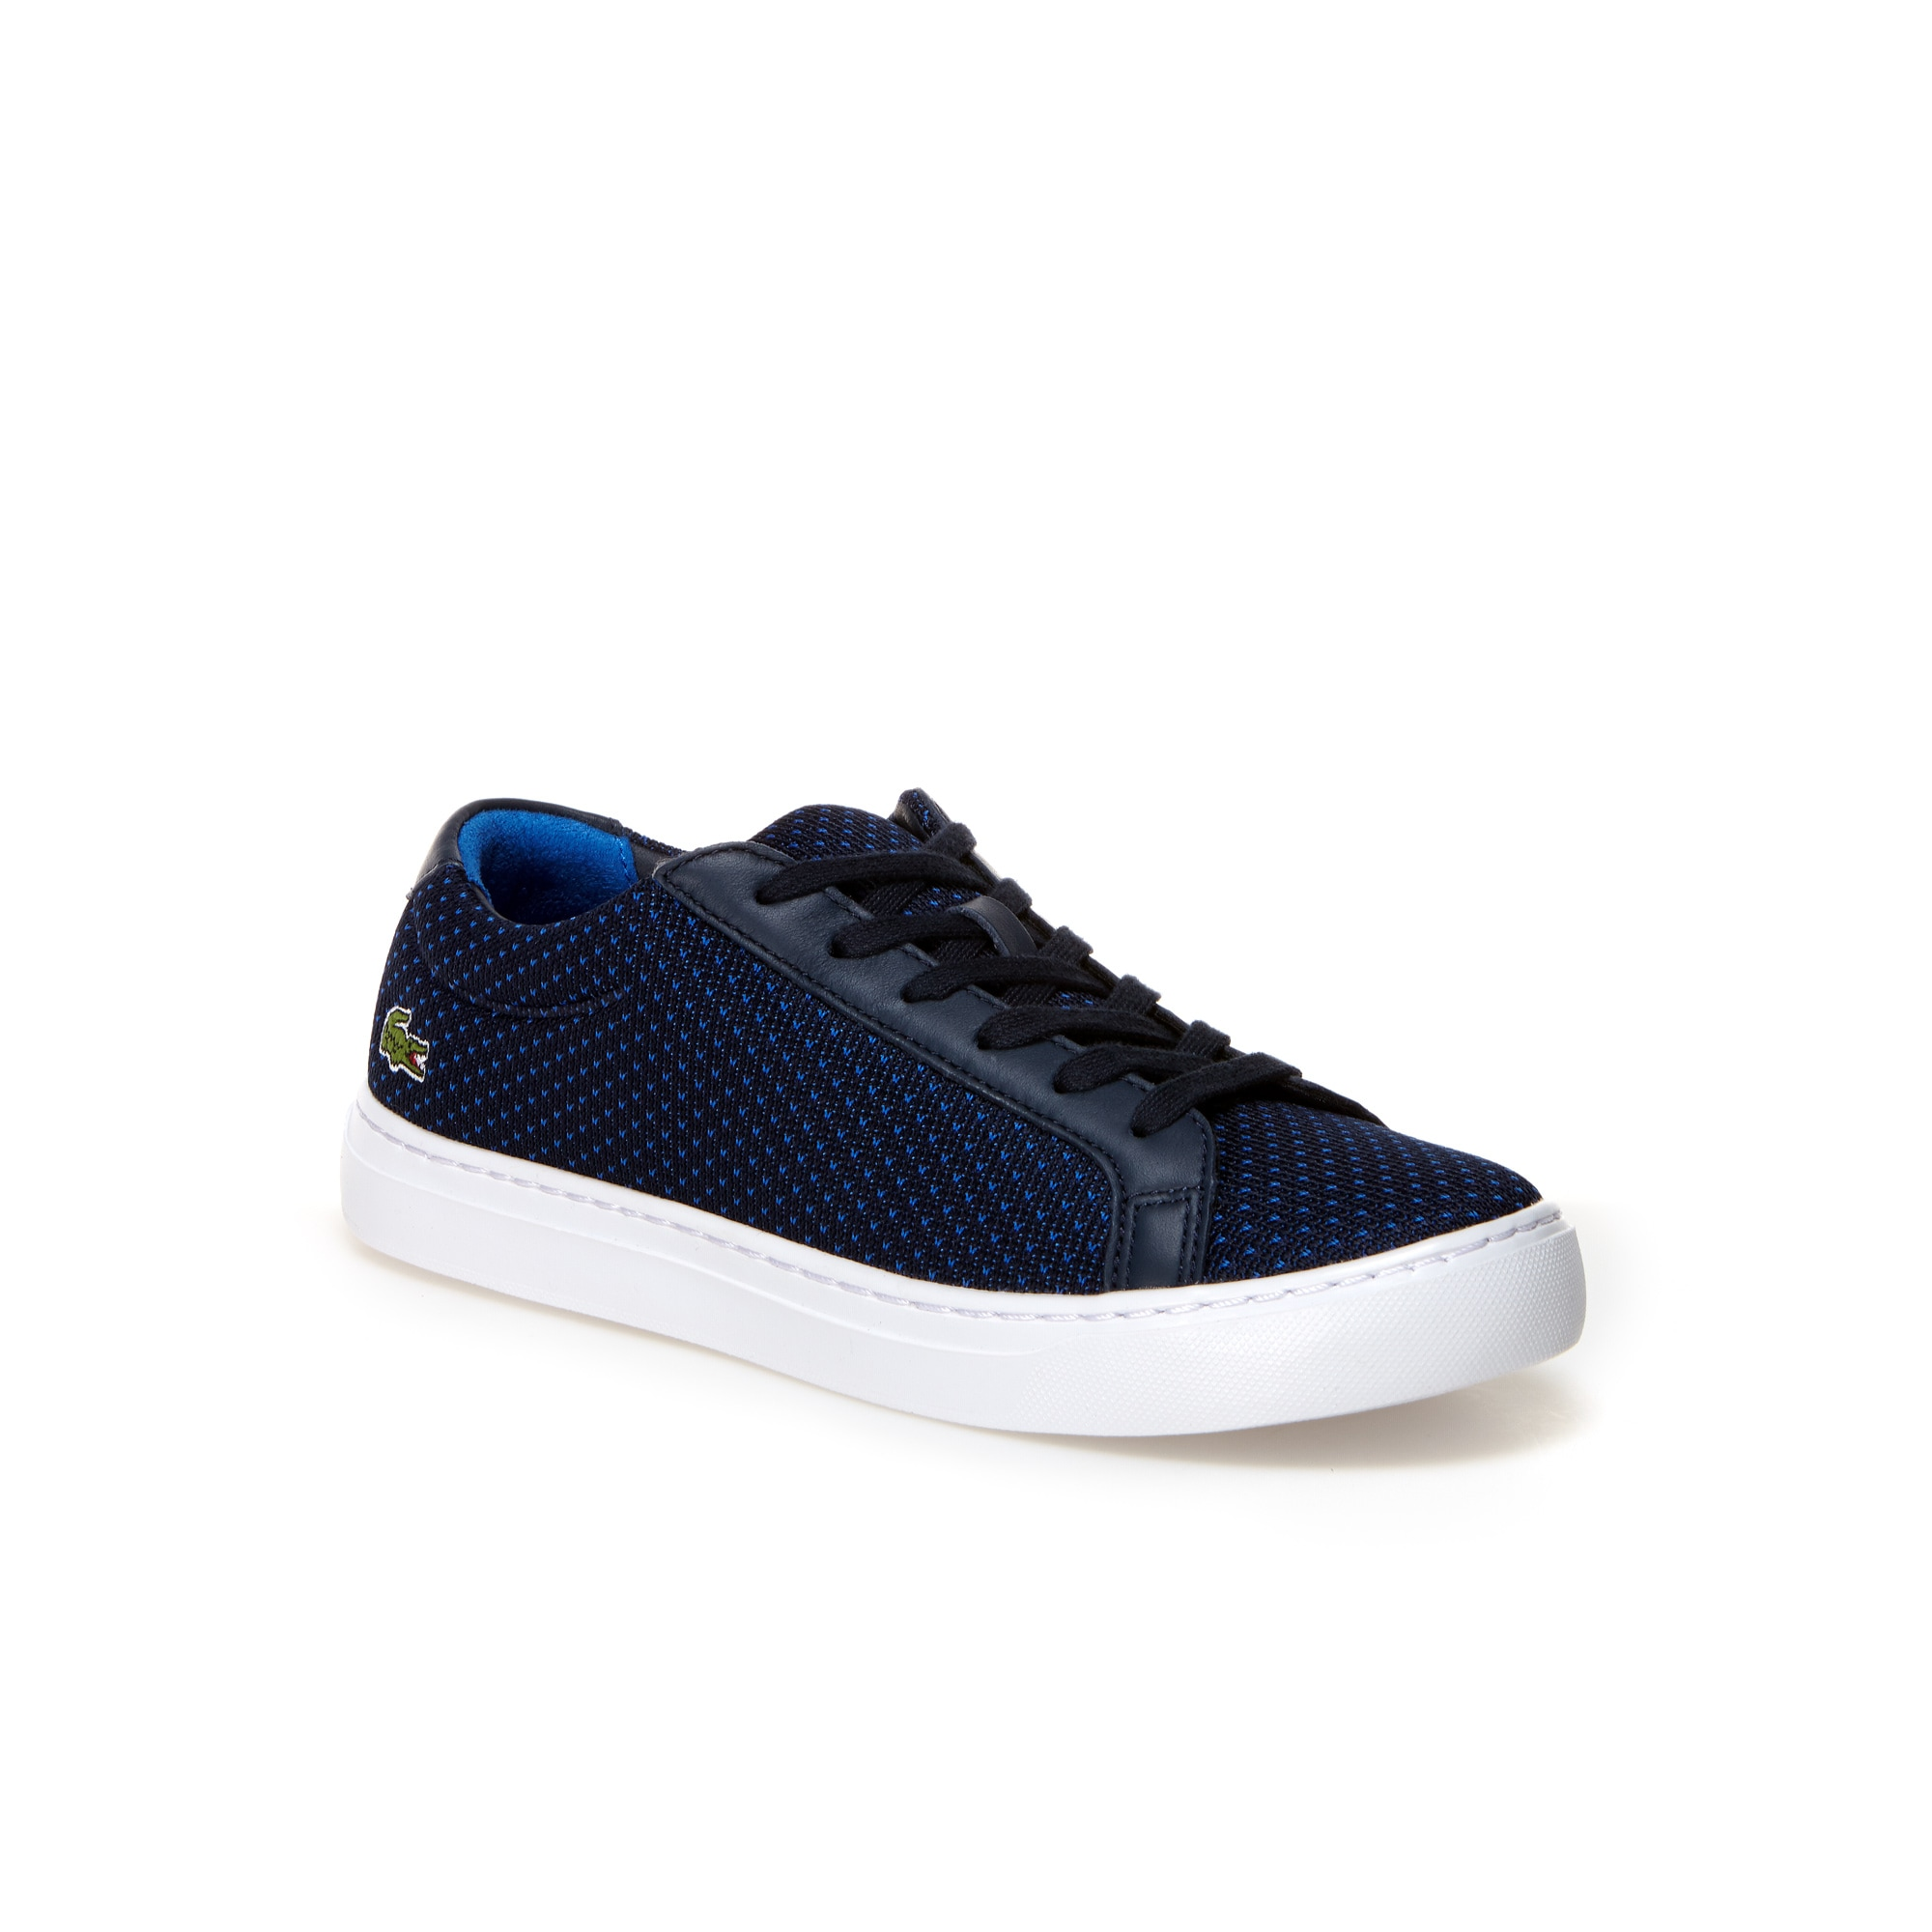 Damen-Sneakers L.12.12 LIGHTWEIGHT aus Stoff